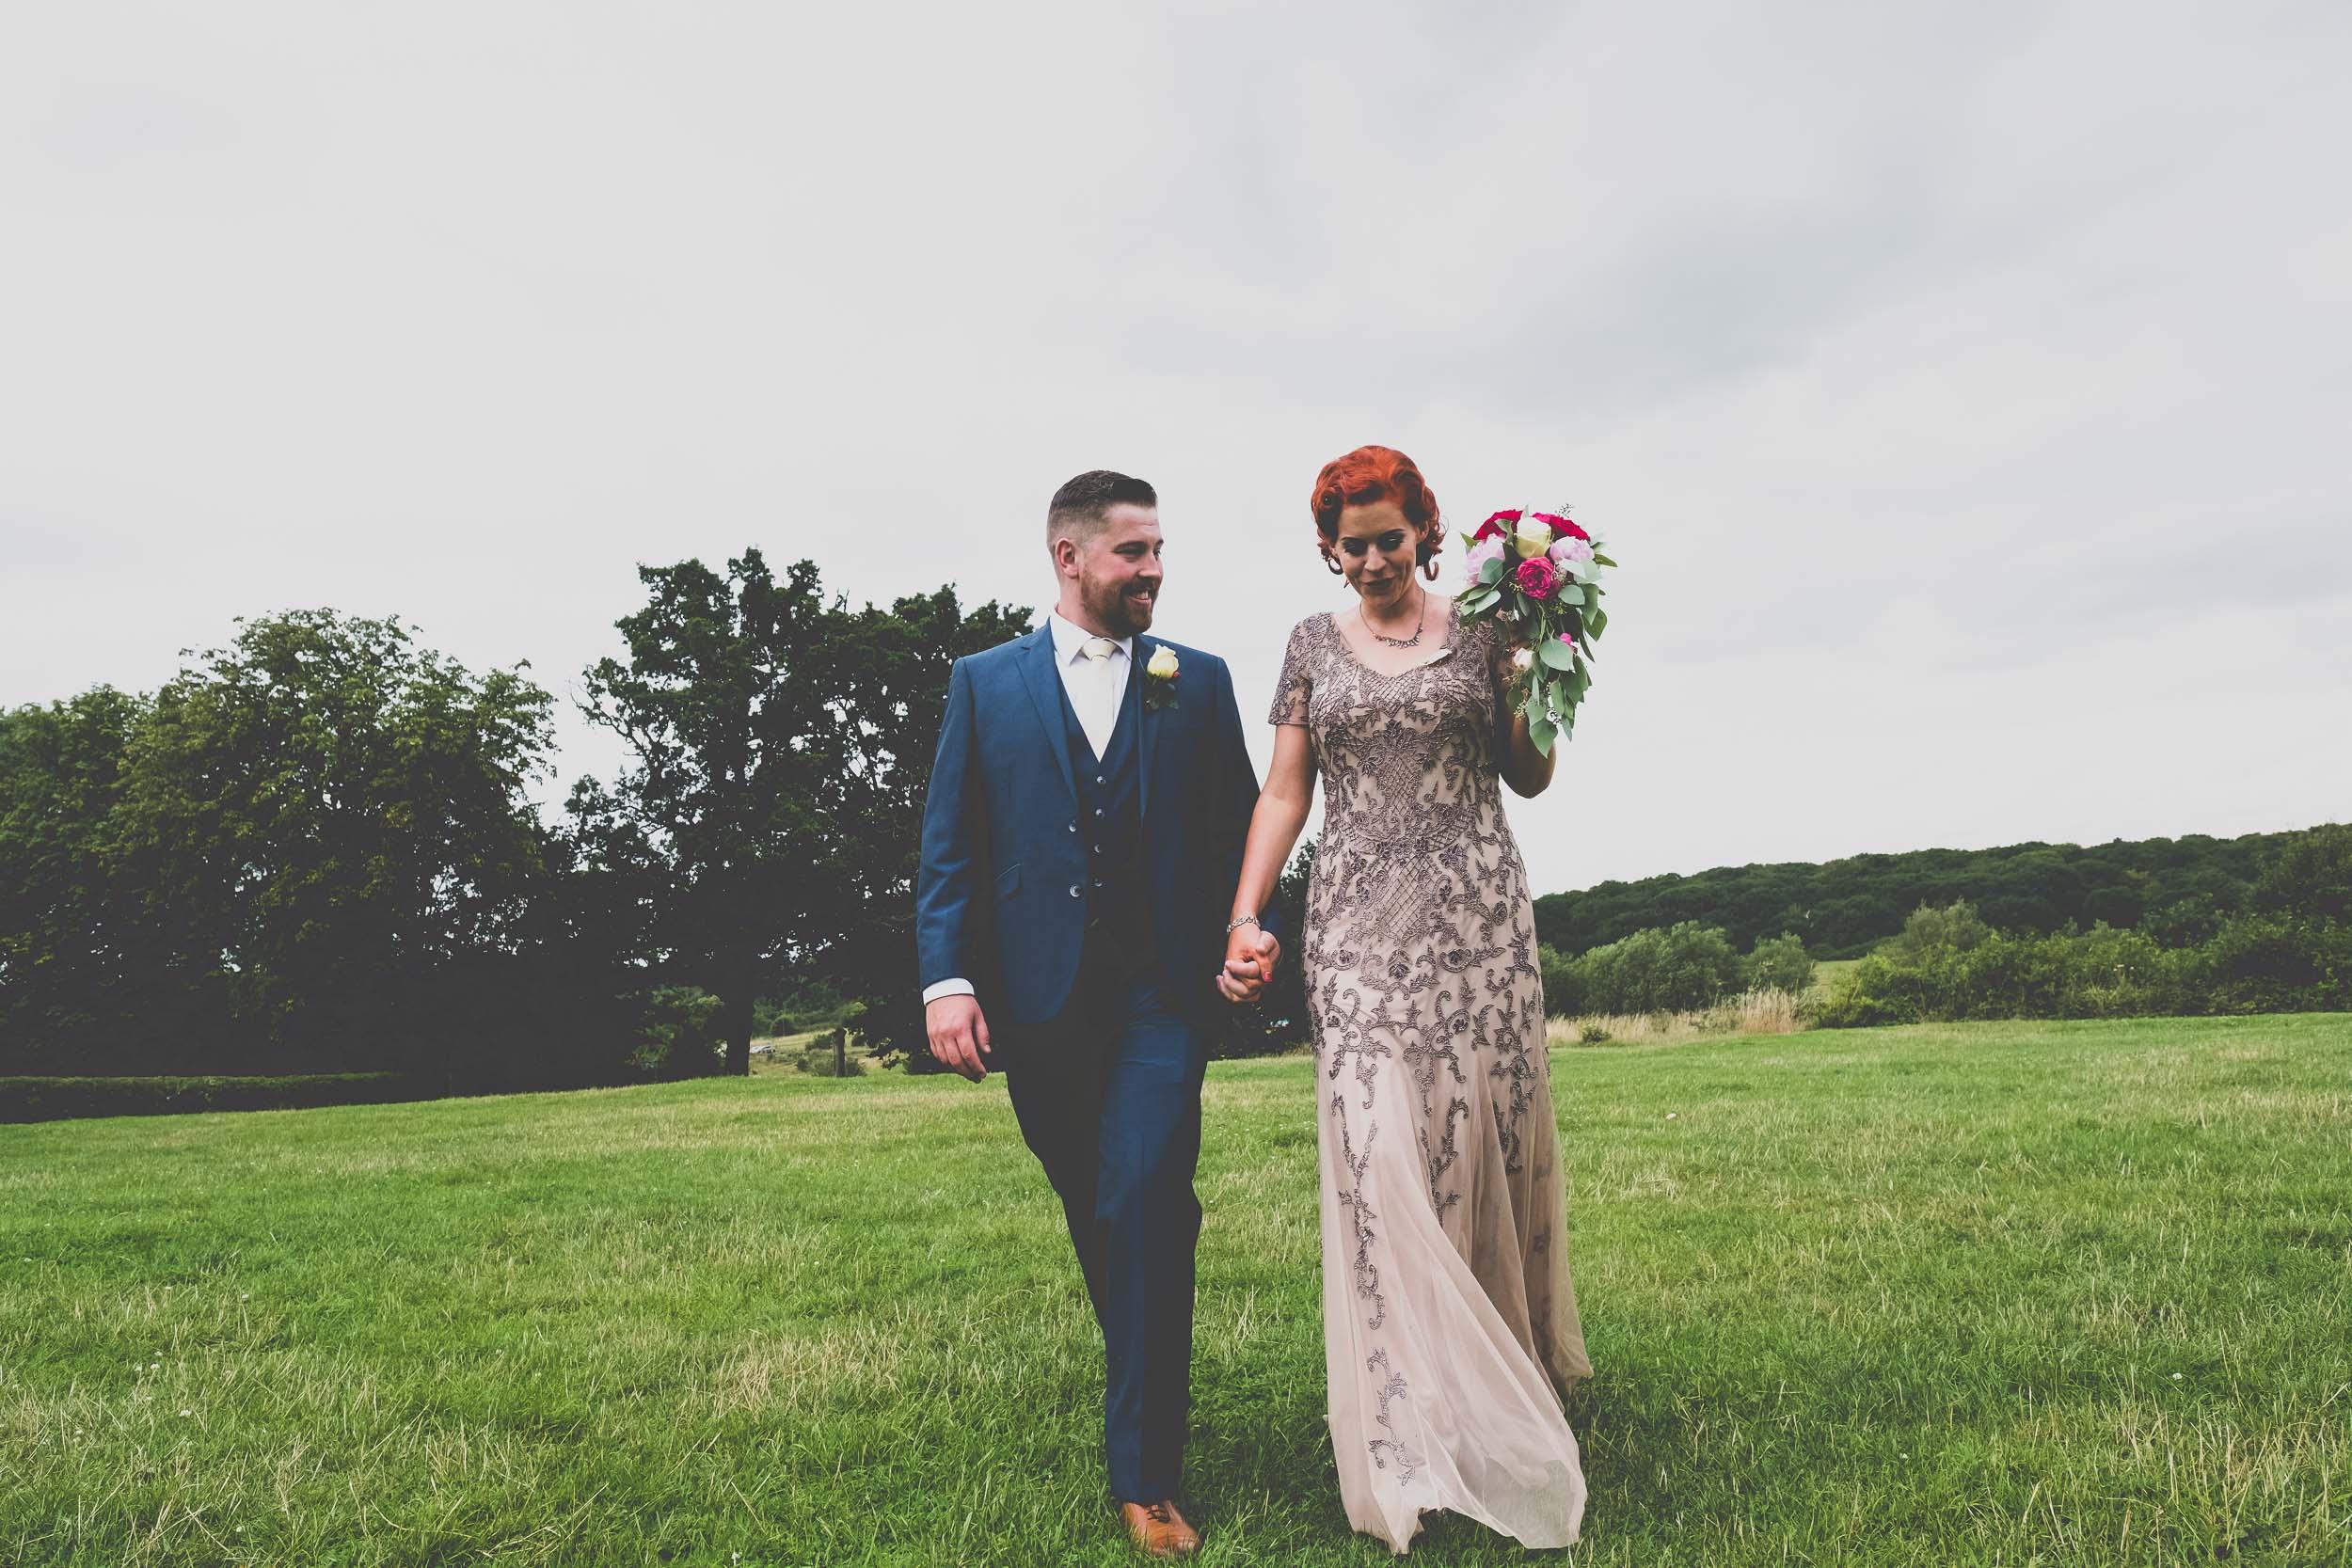 queen-elizabeths-hunting-lodge-epping-forest-wedding210.jpg